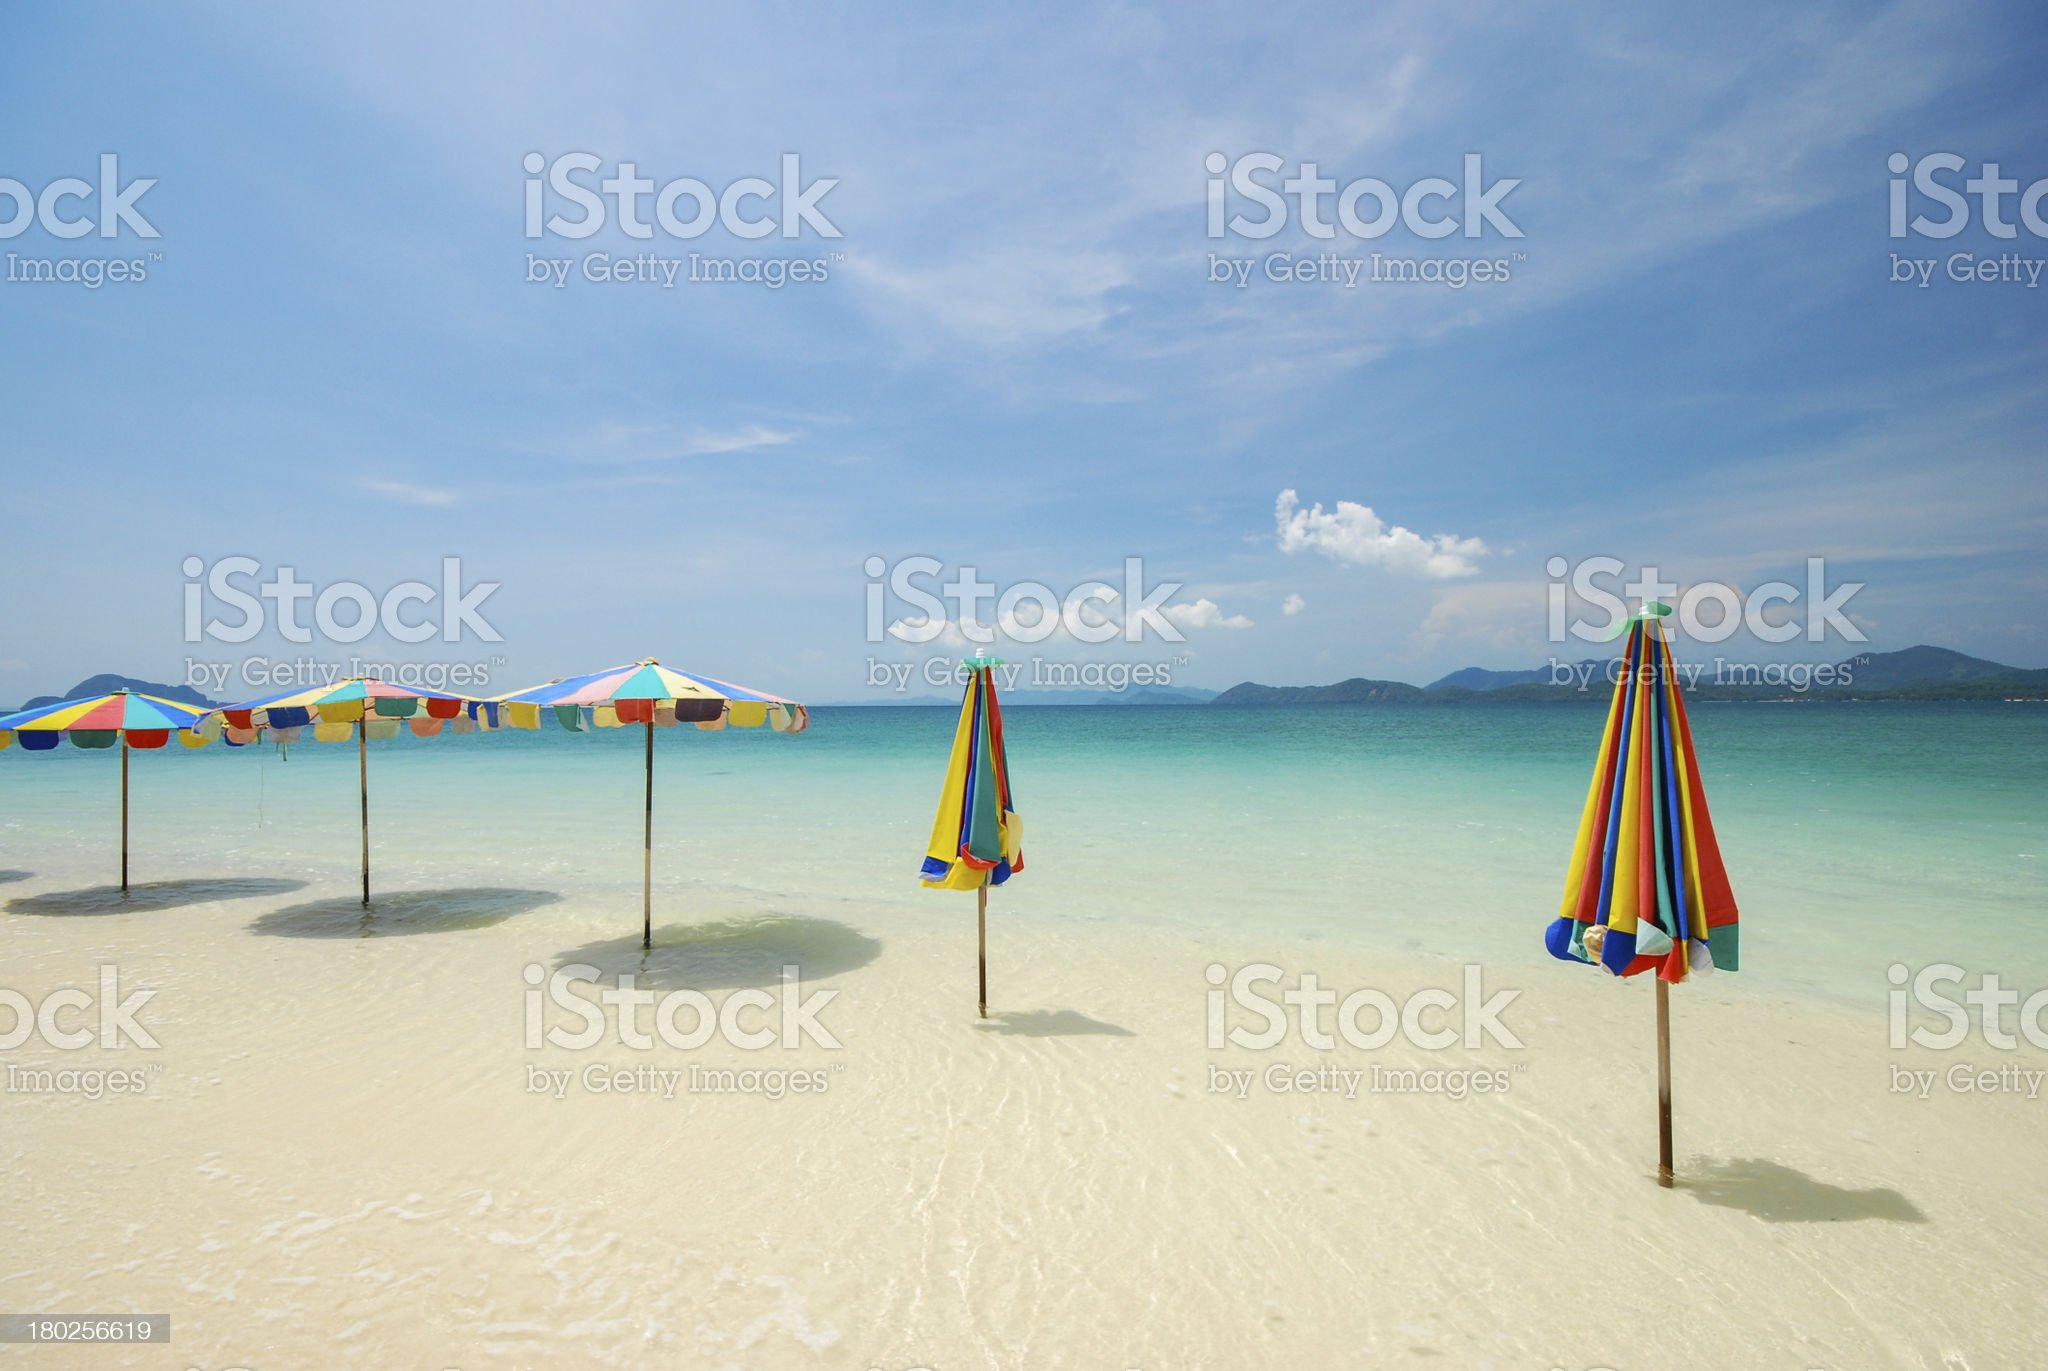 Colorful beach umbrella royalty-free stock photo